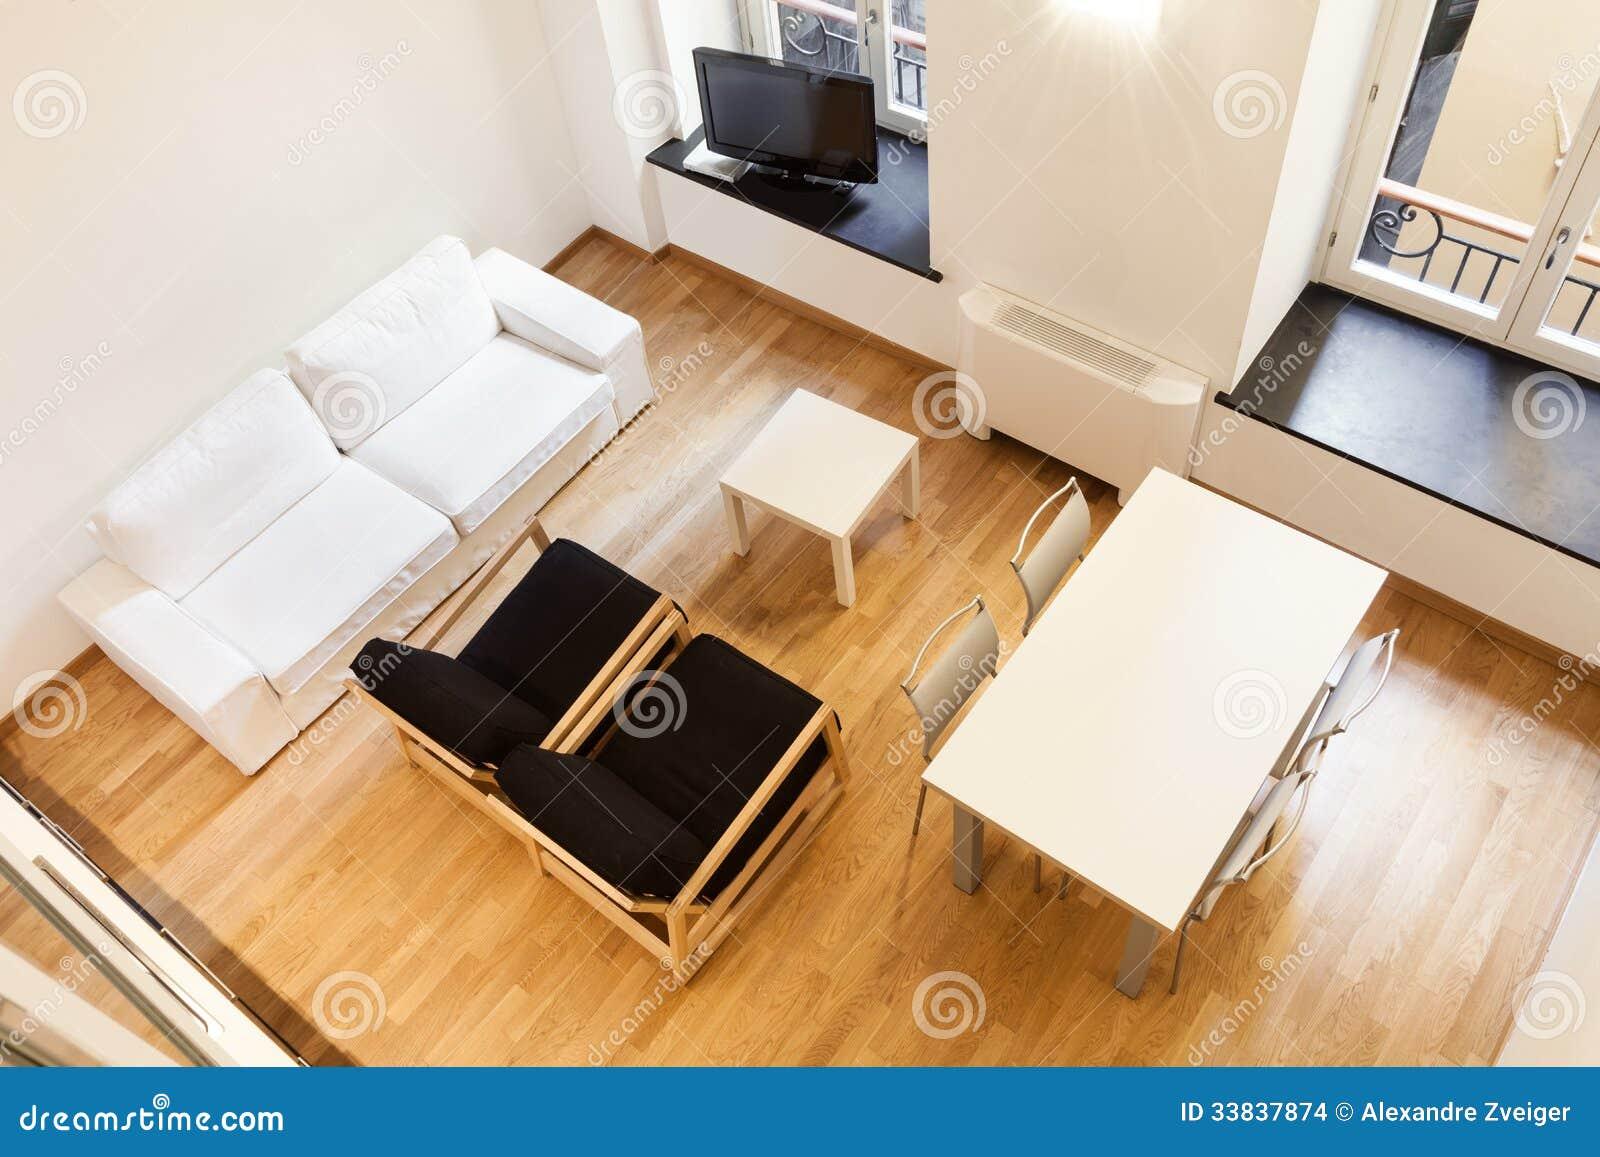 Interior new apartment stock images image 33837874 for Apartment photos interior